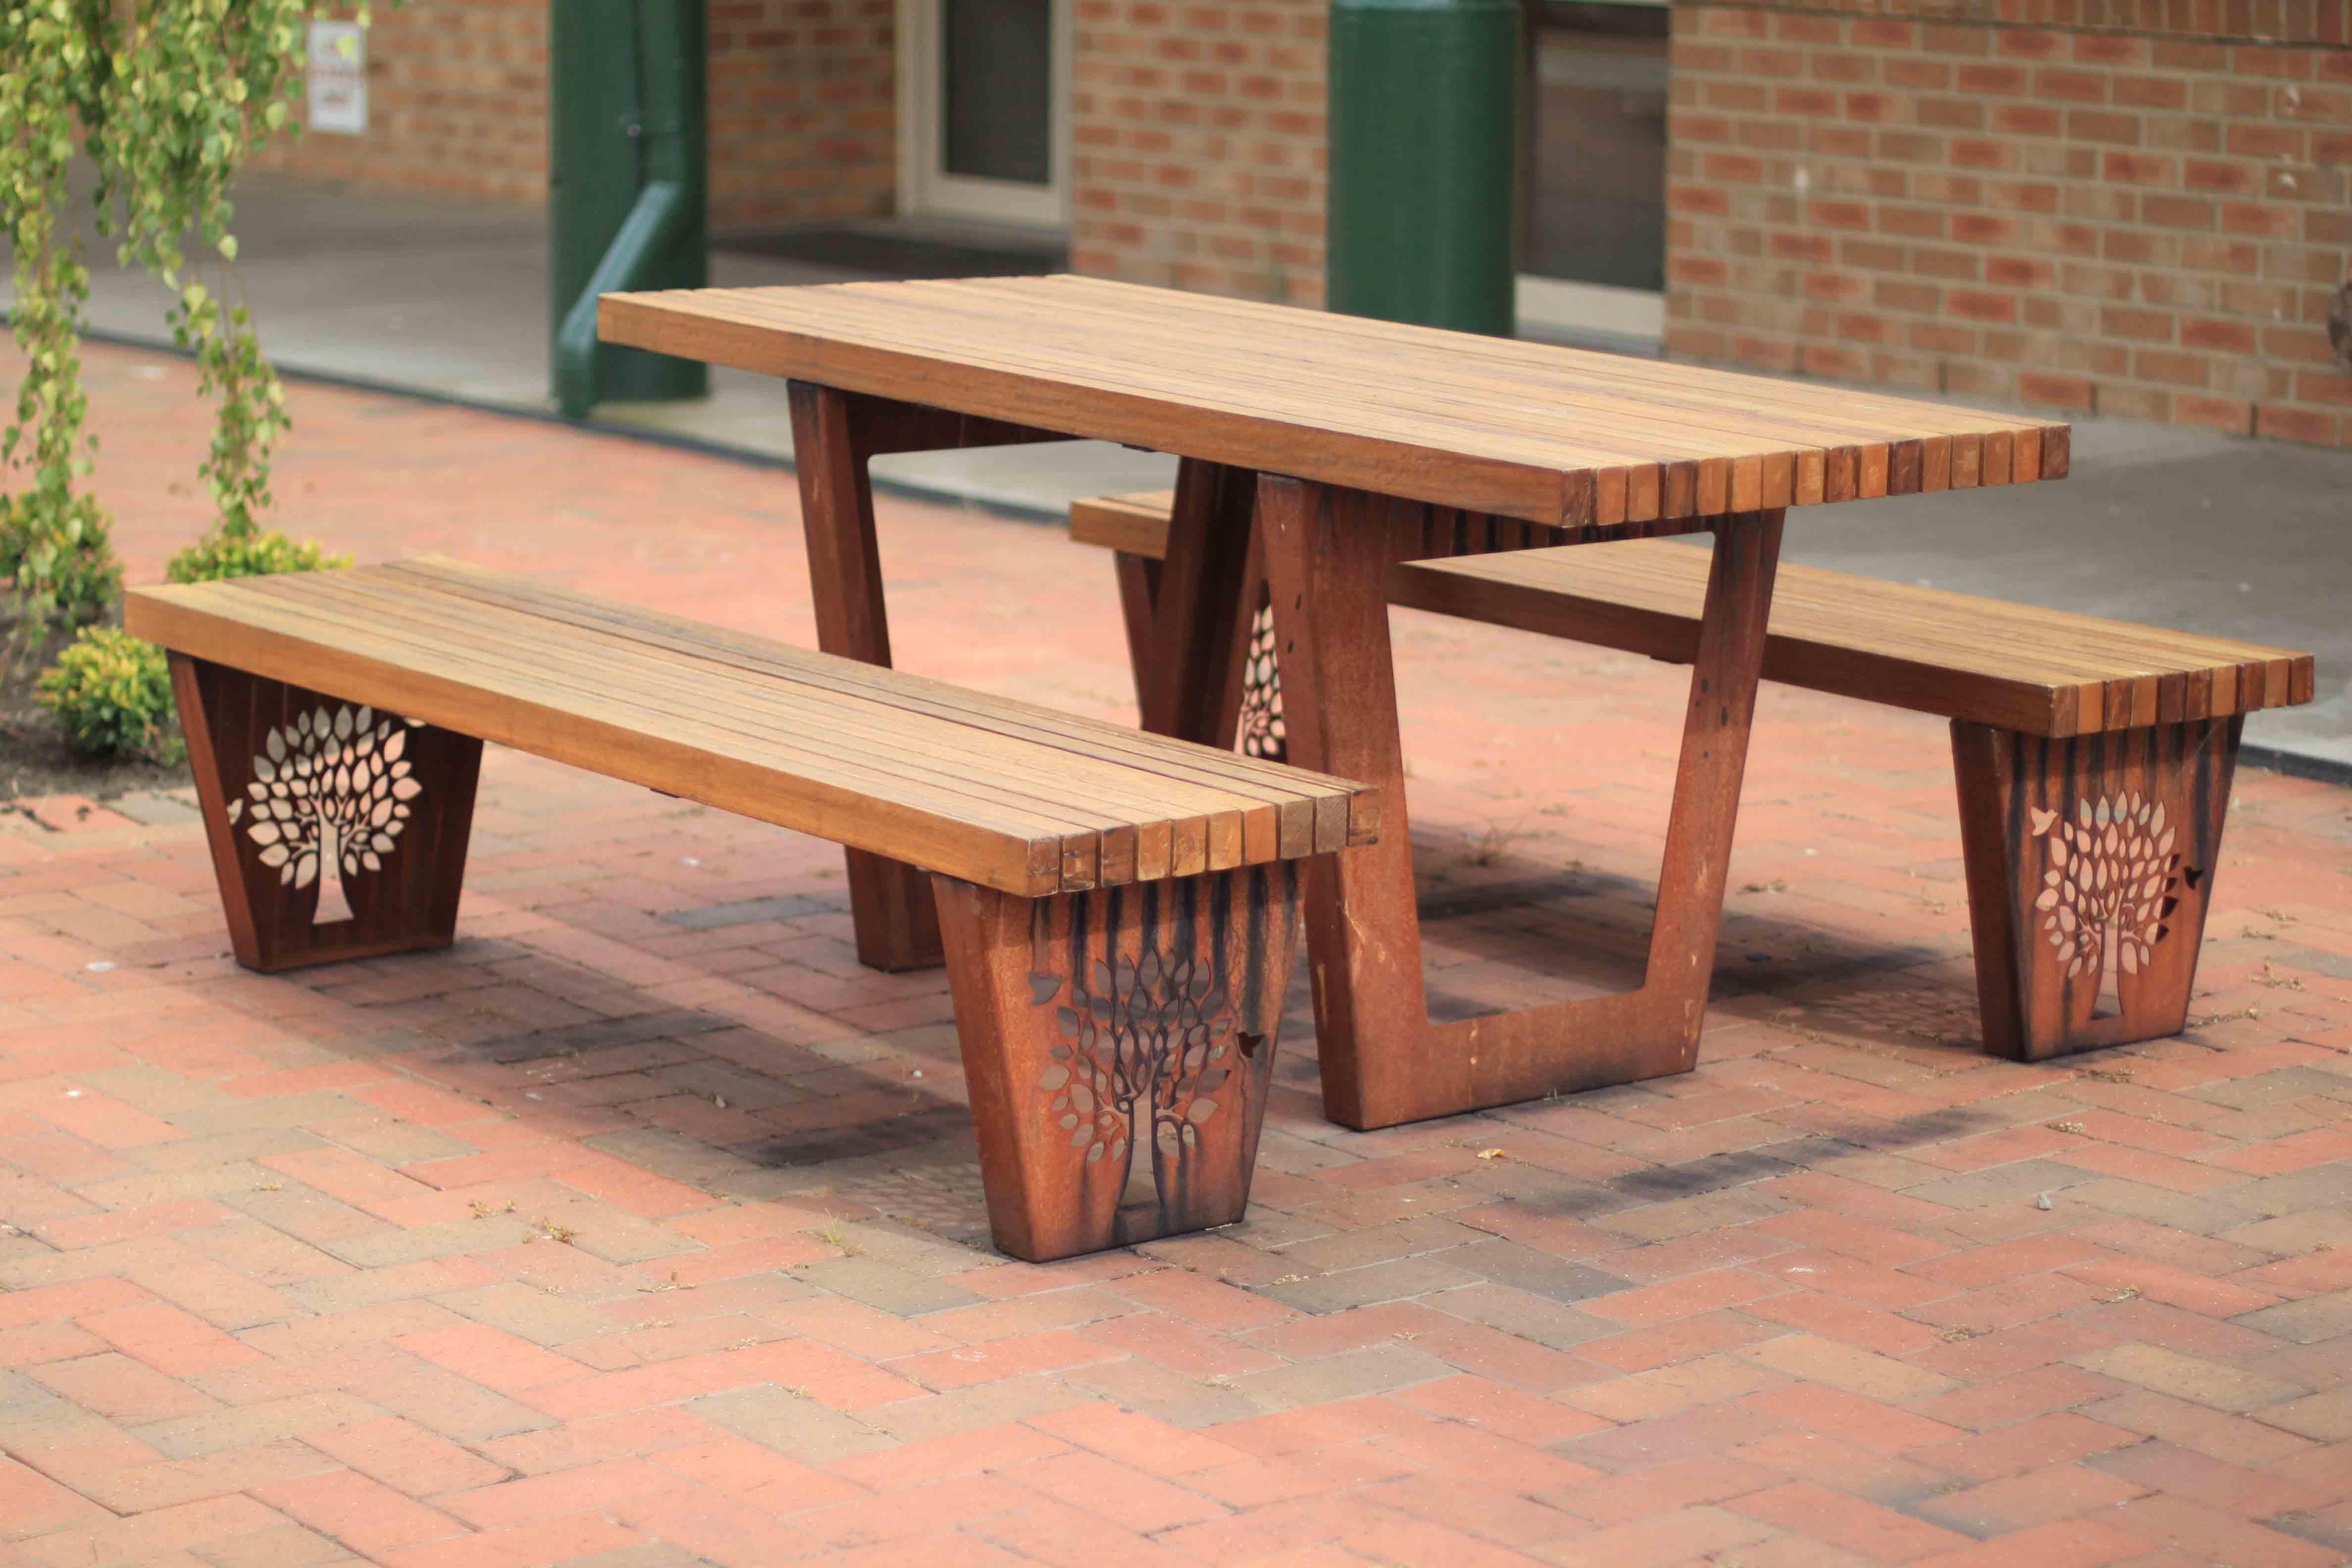 TM4550 TM4552 (Rustic Corten frame, Australian hardwood timber)